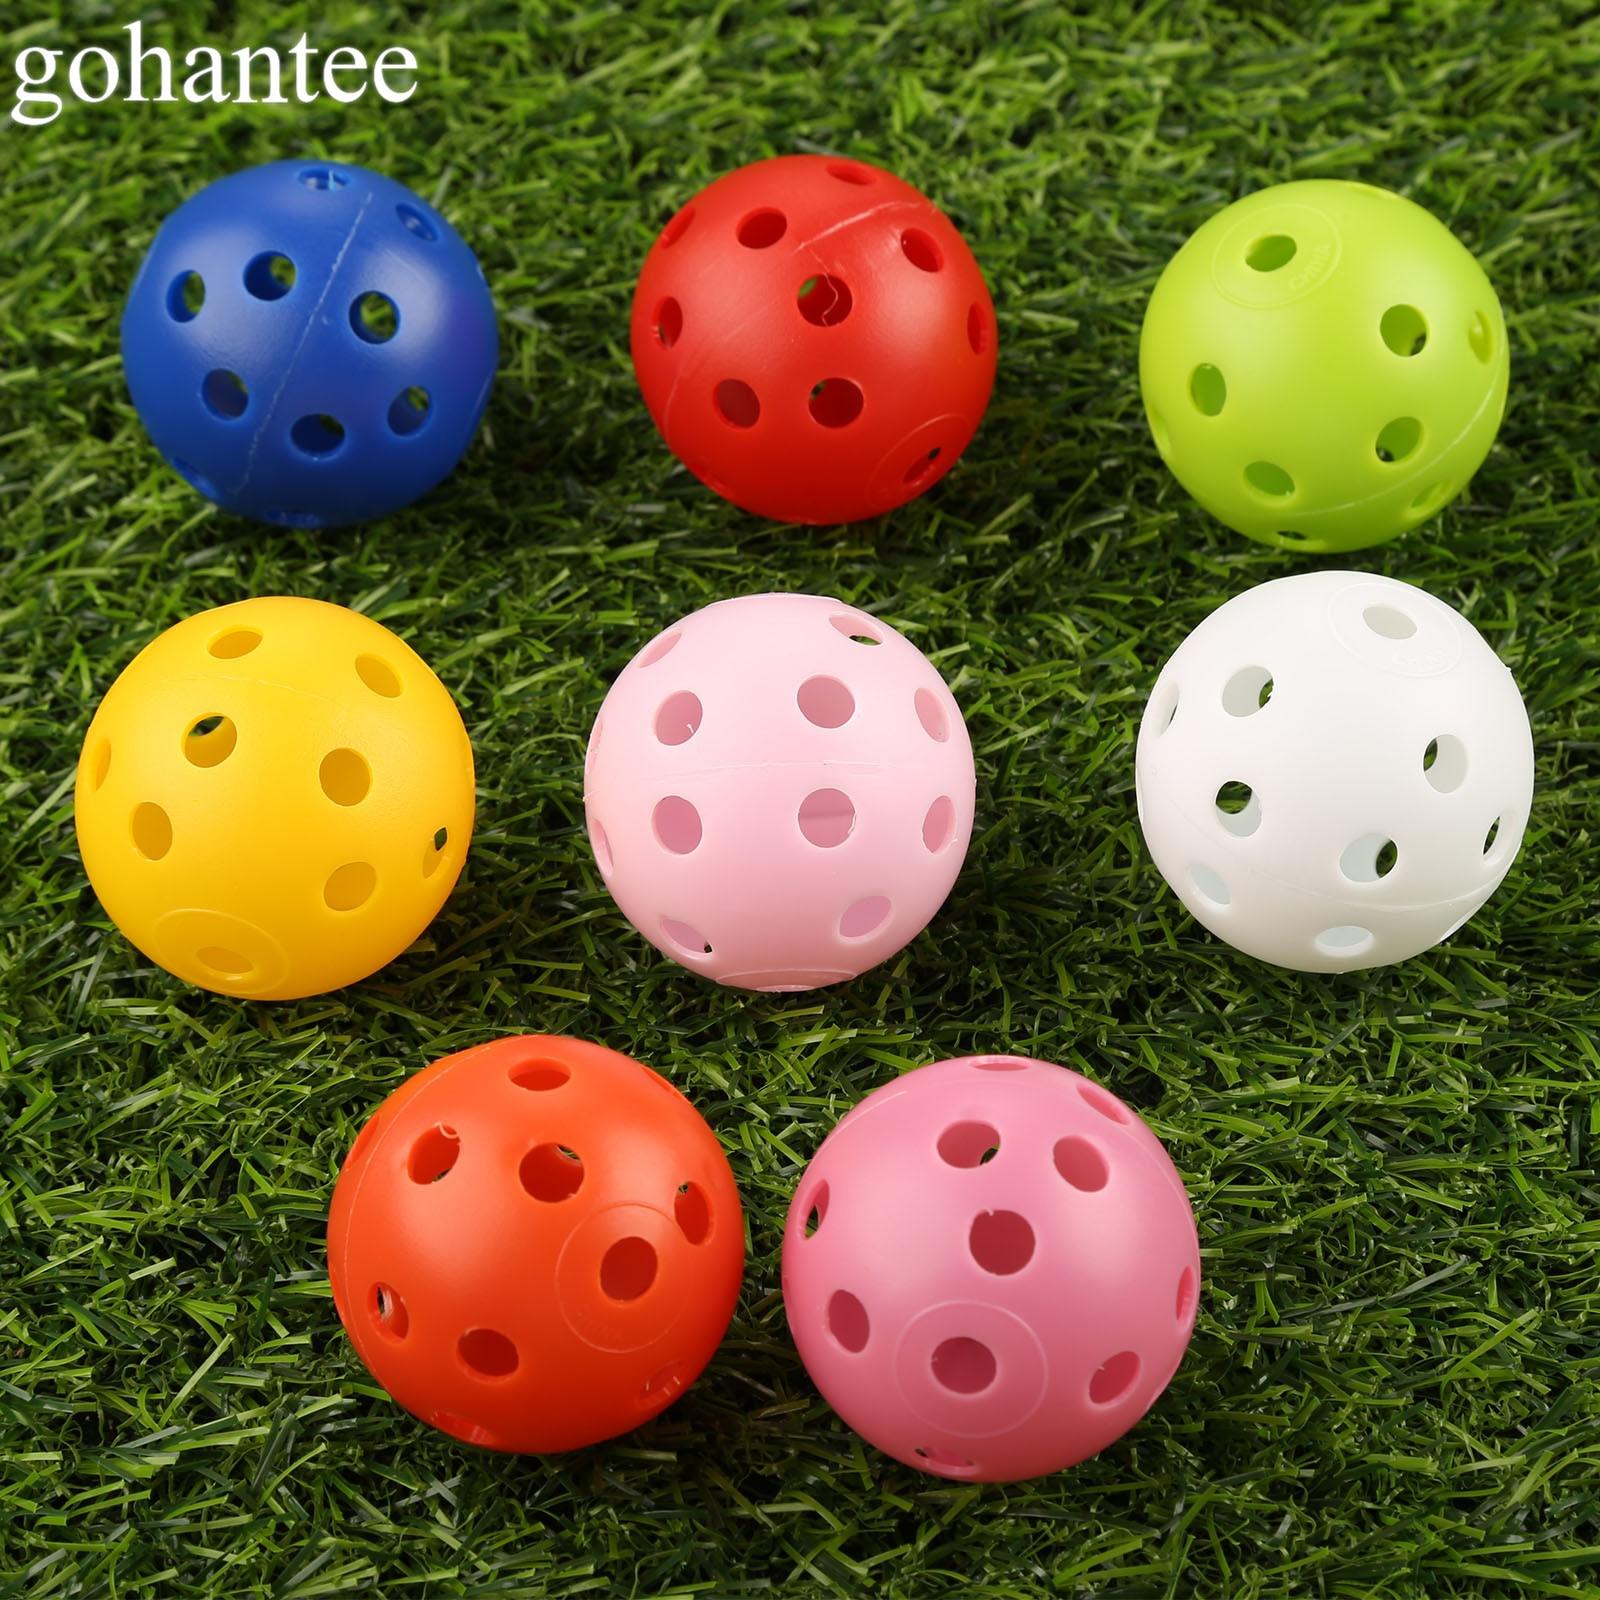 Gohantee 20Pcs 41mm Golf Training Balls Plastic Airflow Hollow With Hole Golf Balls Outdoor Golf Practice Balls Golf Accessories